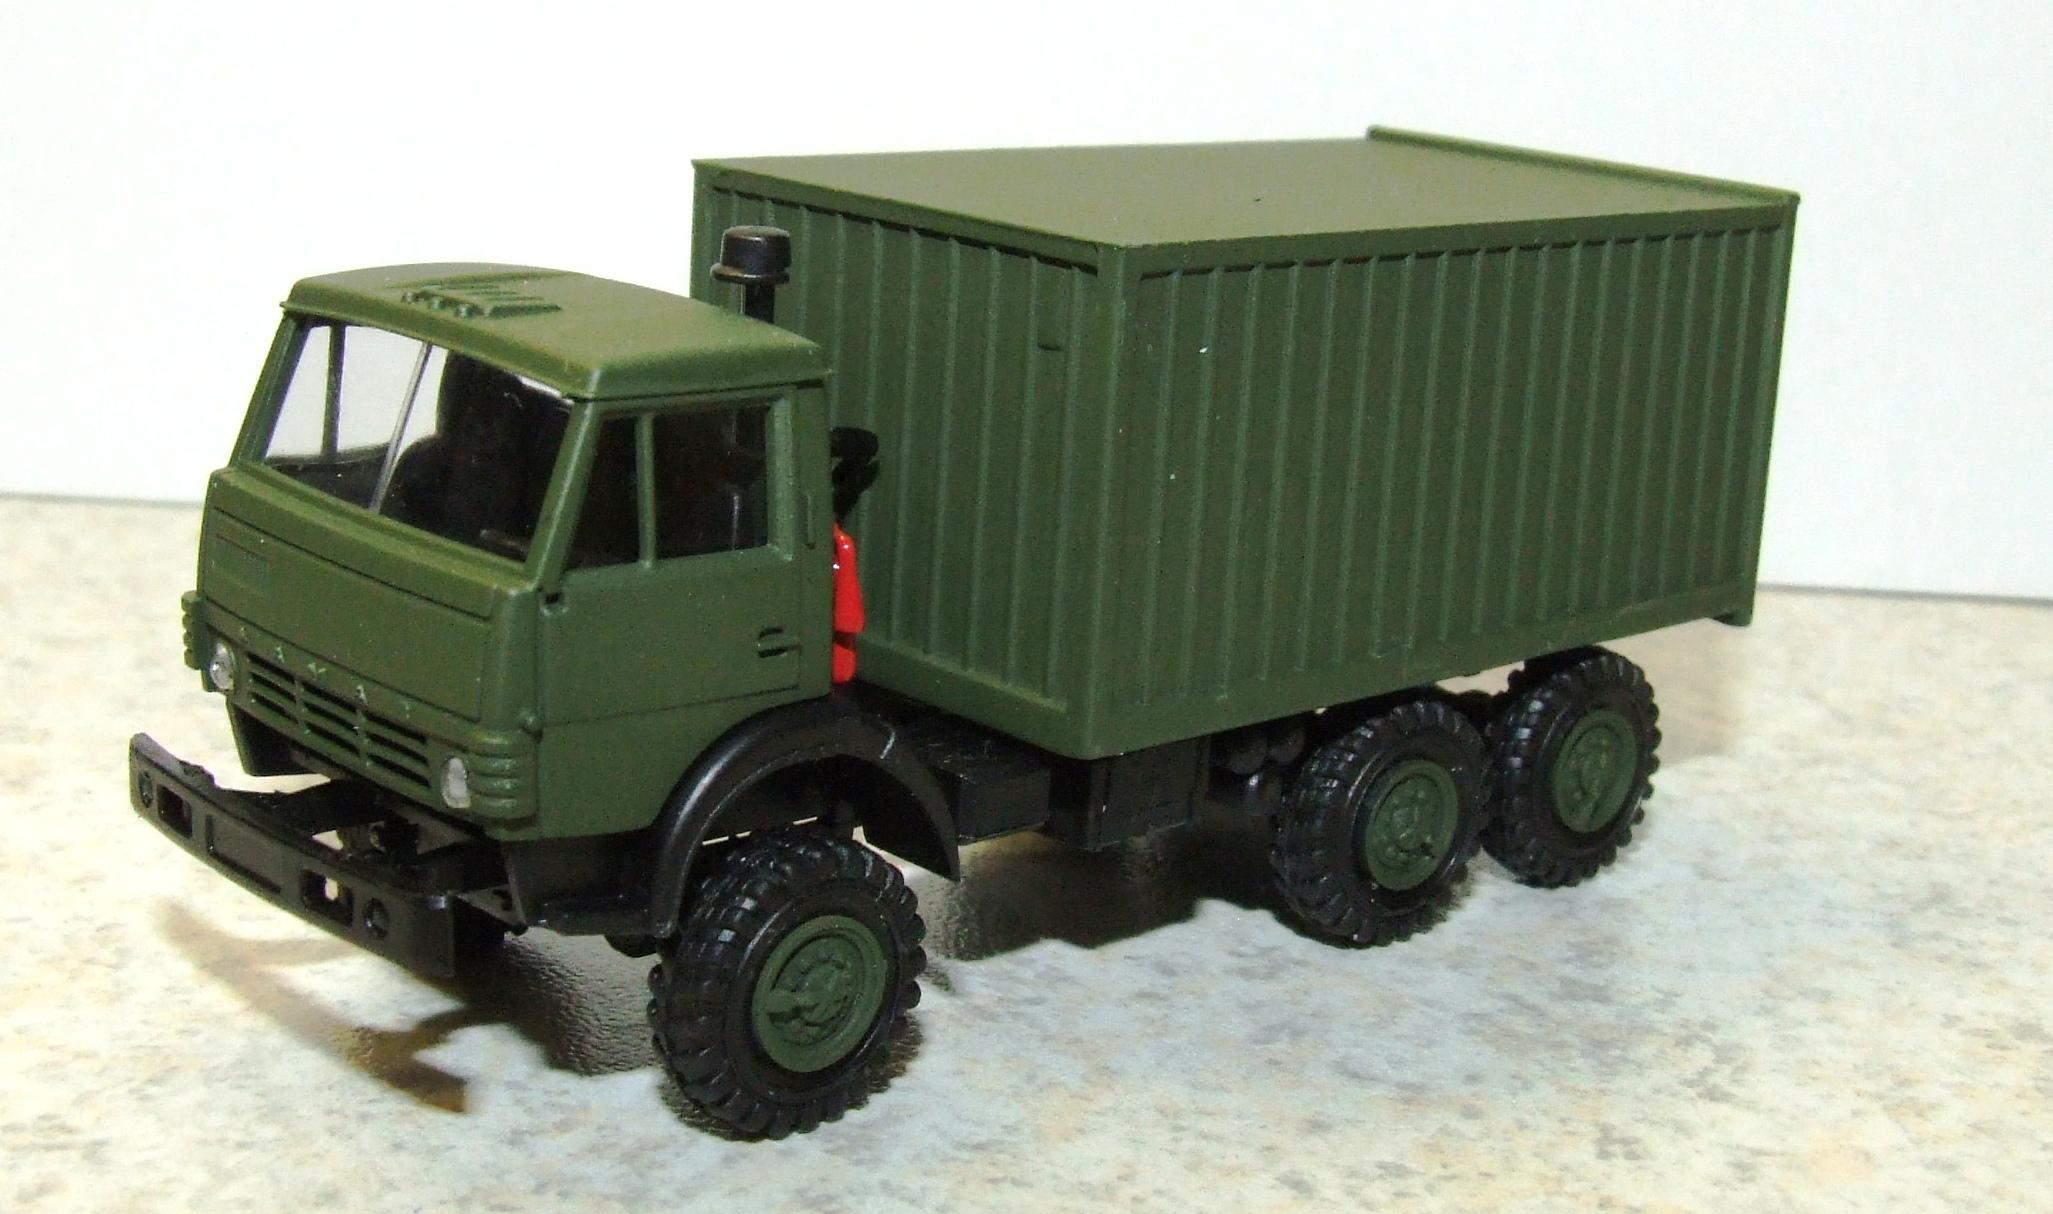 Herpa H0 1:87 Roco Minitanks 744935 Kamaz 5320 Koffer LKW NVA WP